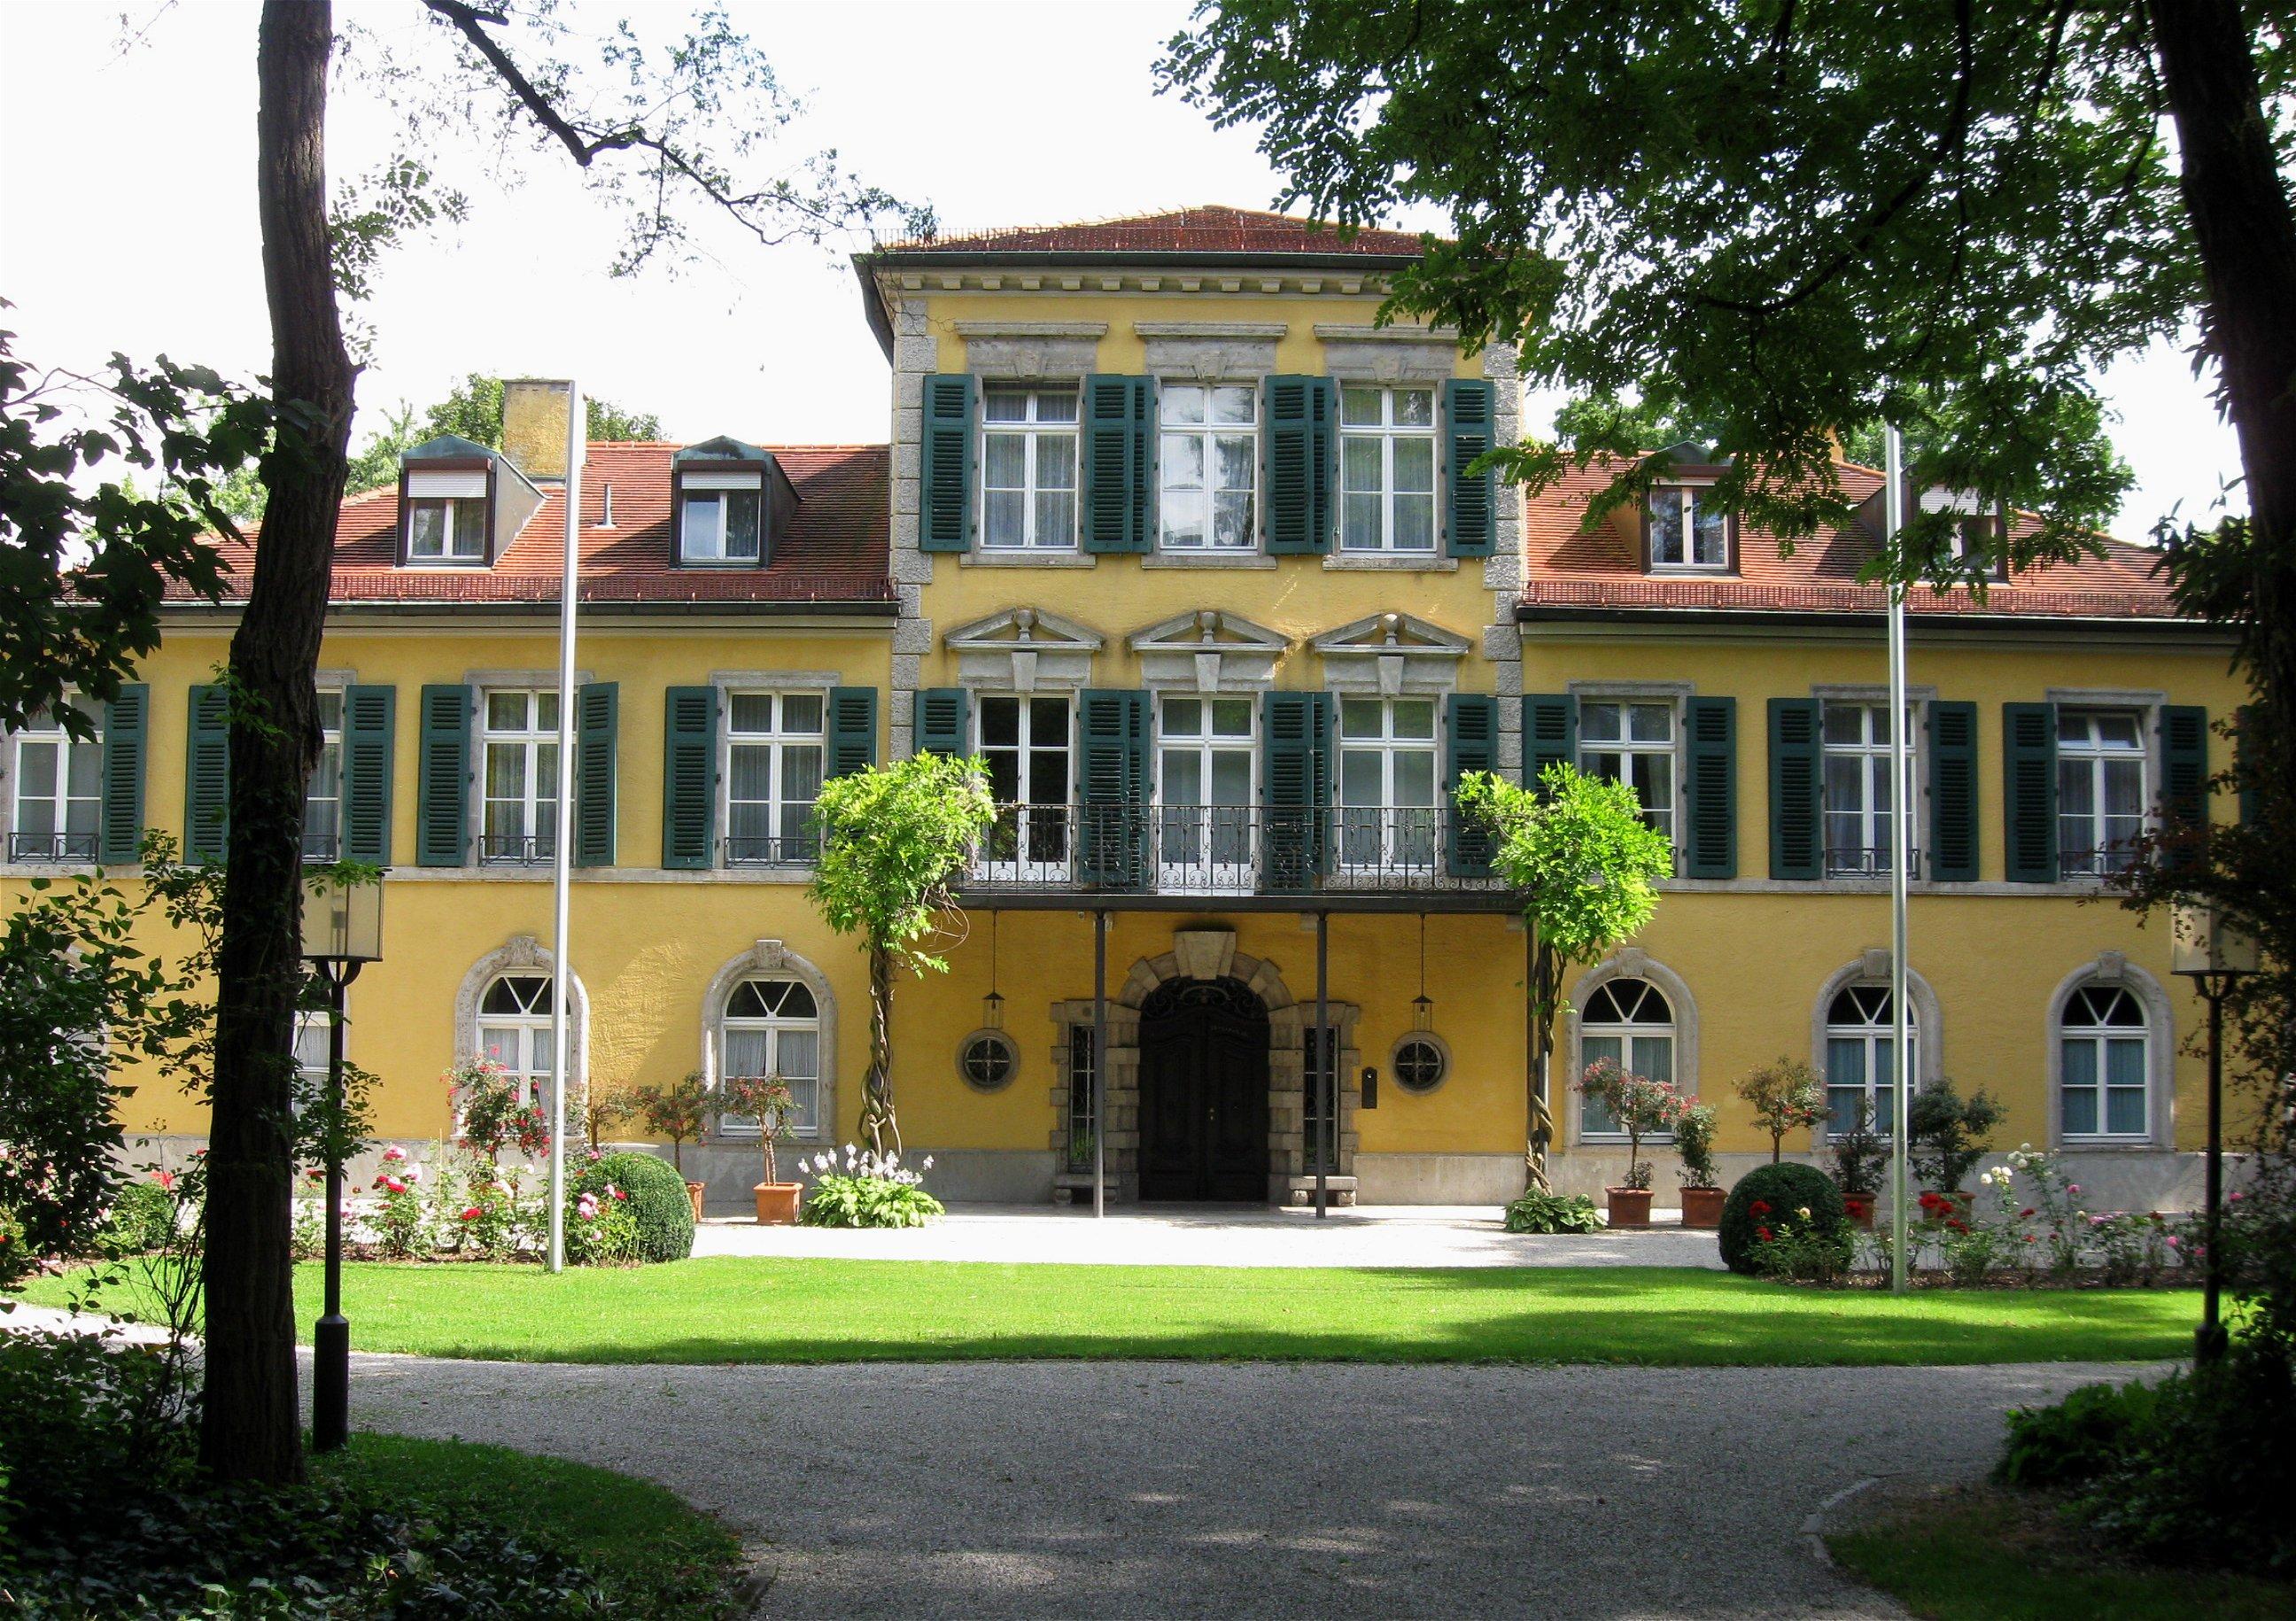 File:Schloss Suresnes Muenchen Schwabing-2.jpg - Wikimedia ...